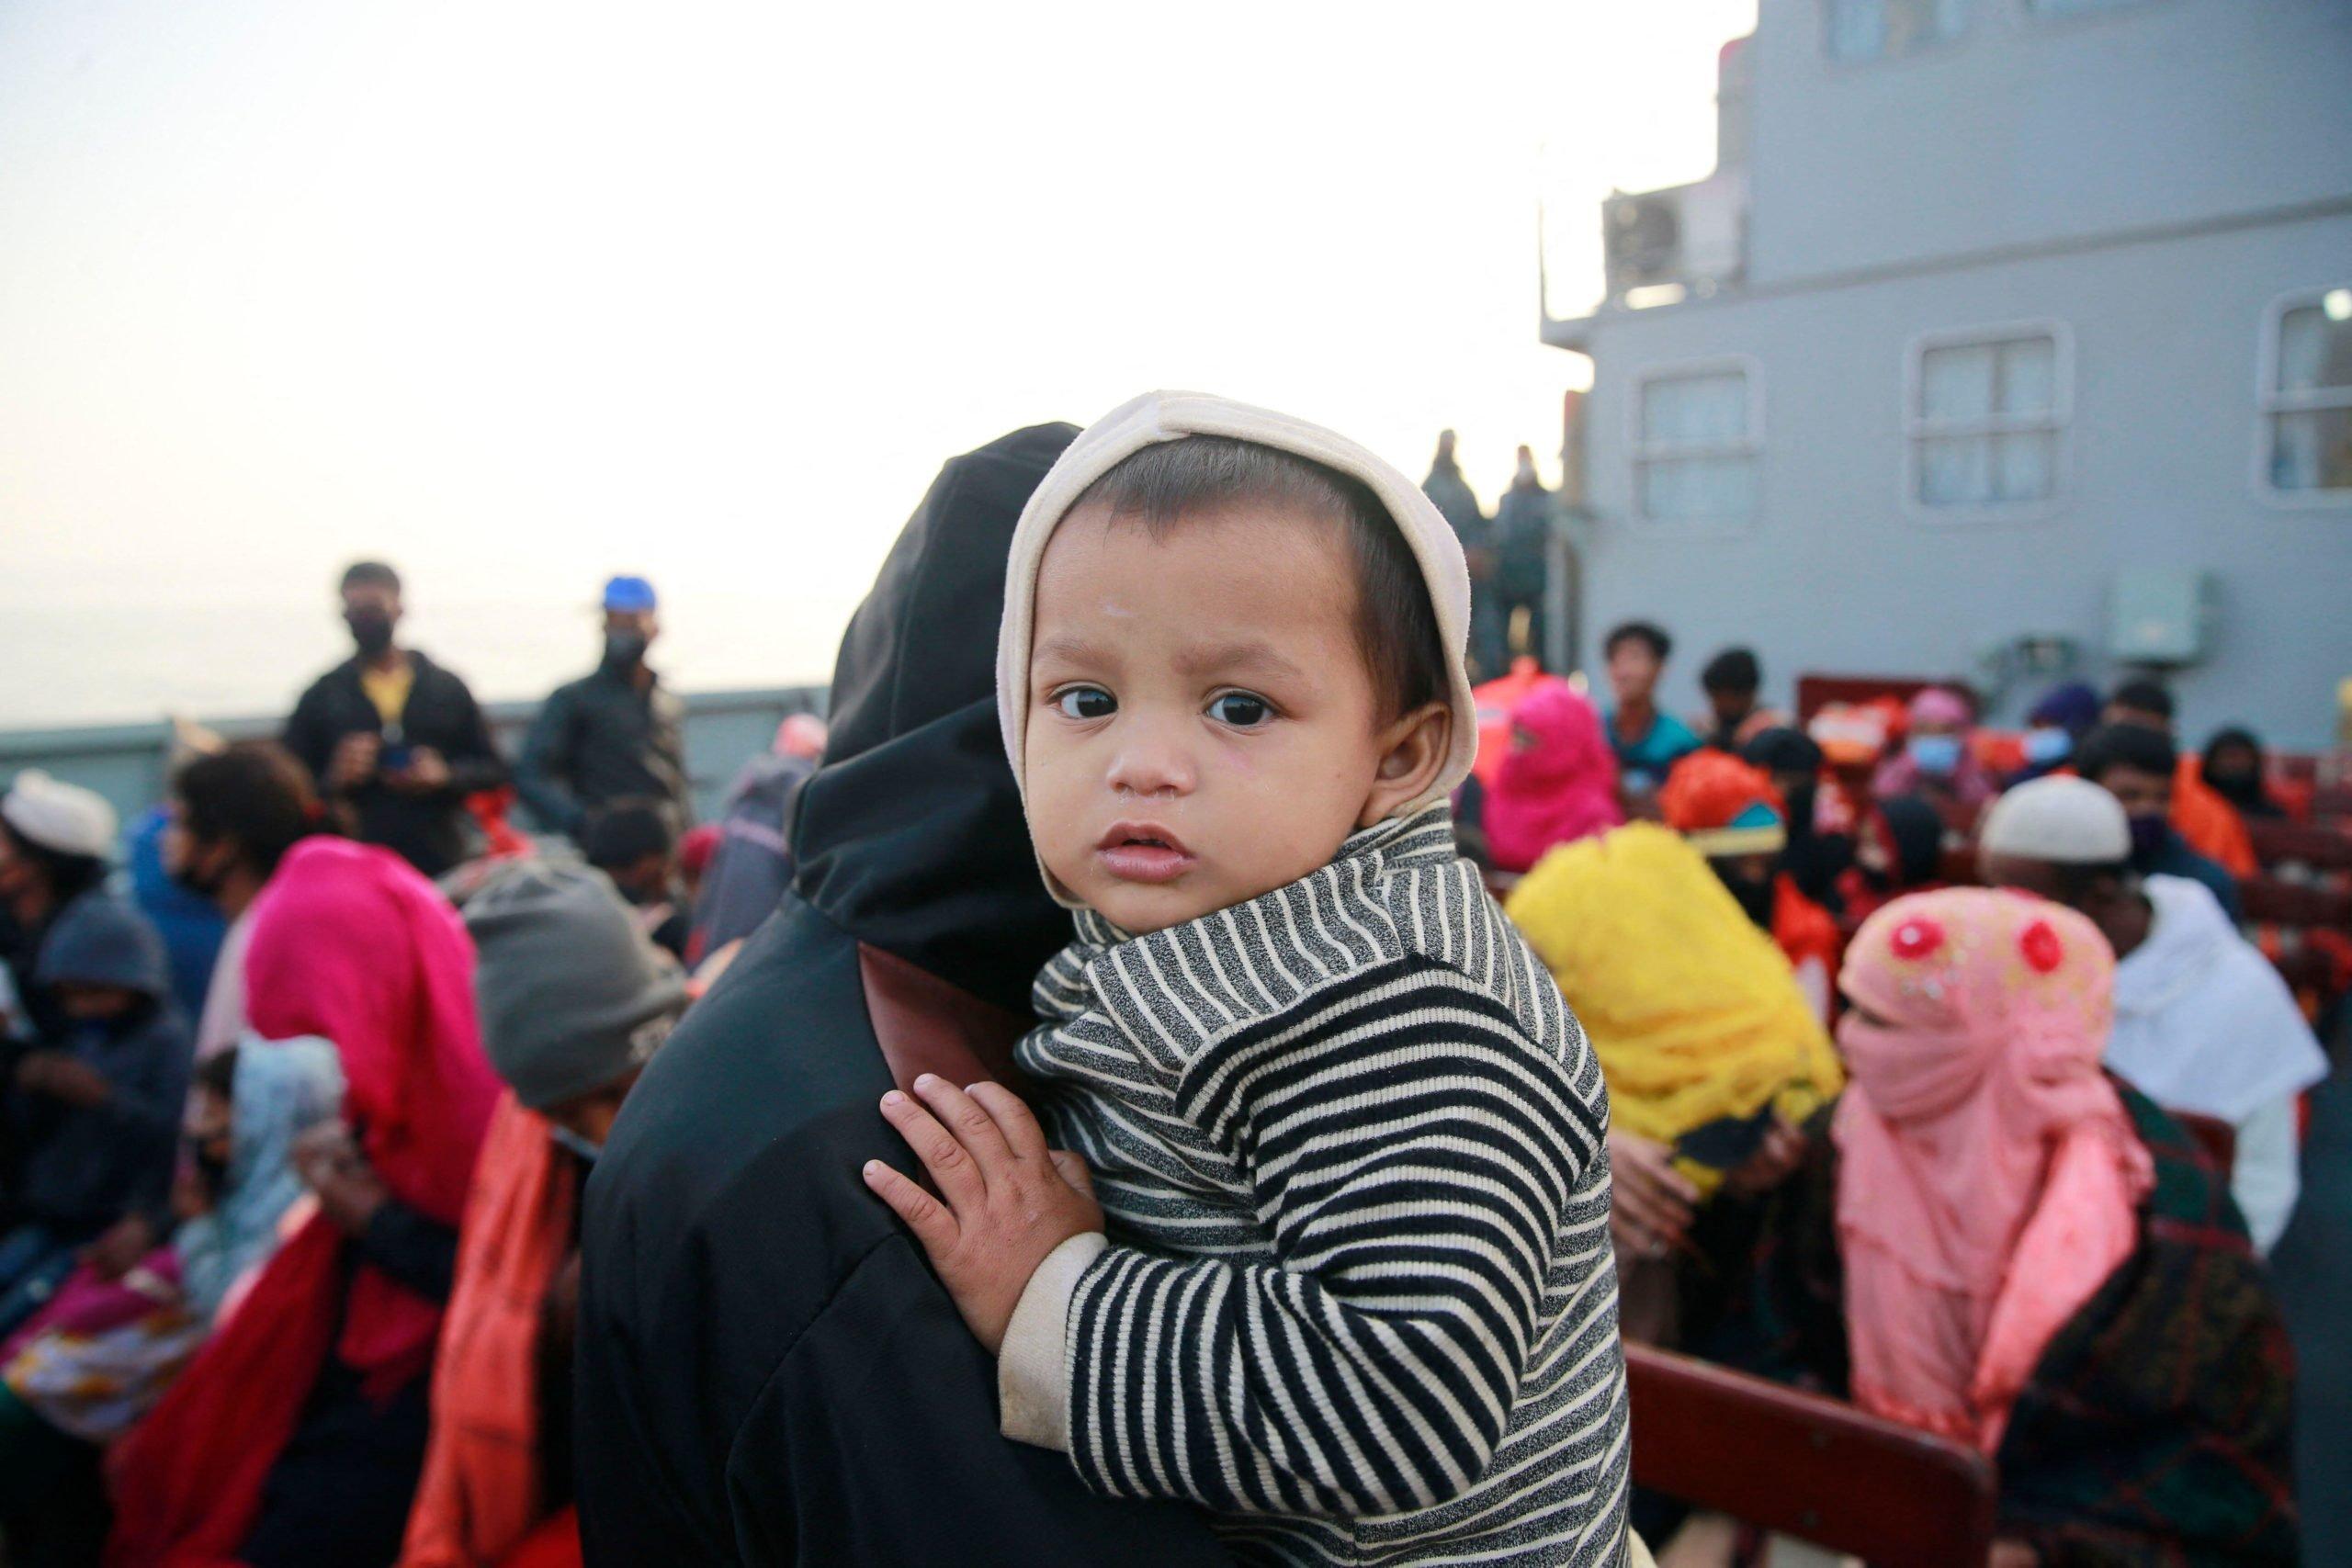 Rohingya refugees being taken to Bhashan Char on a naval ship in December 2020 (Image: Suvra Kanti Das / ABACAPRESS / Alamy Live News)